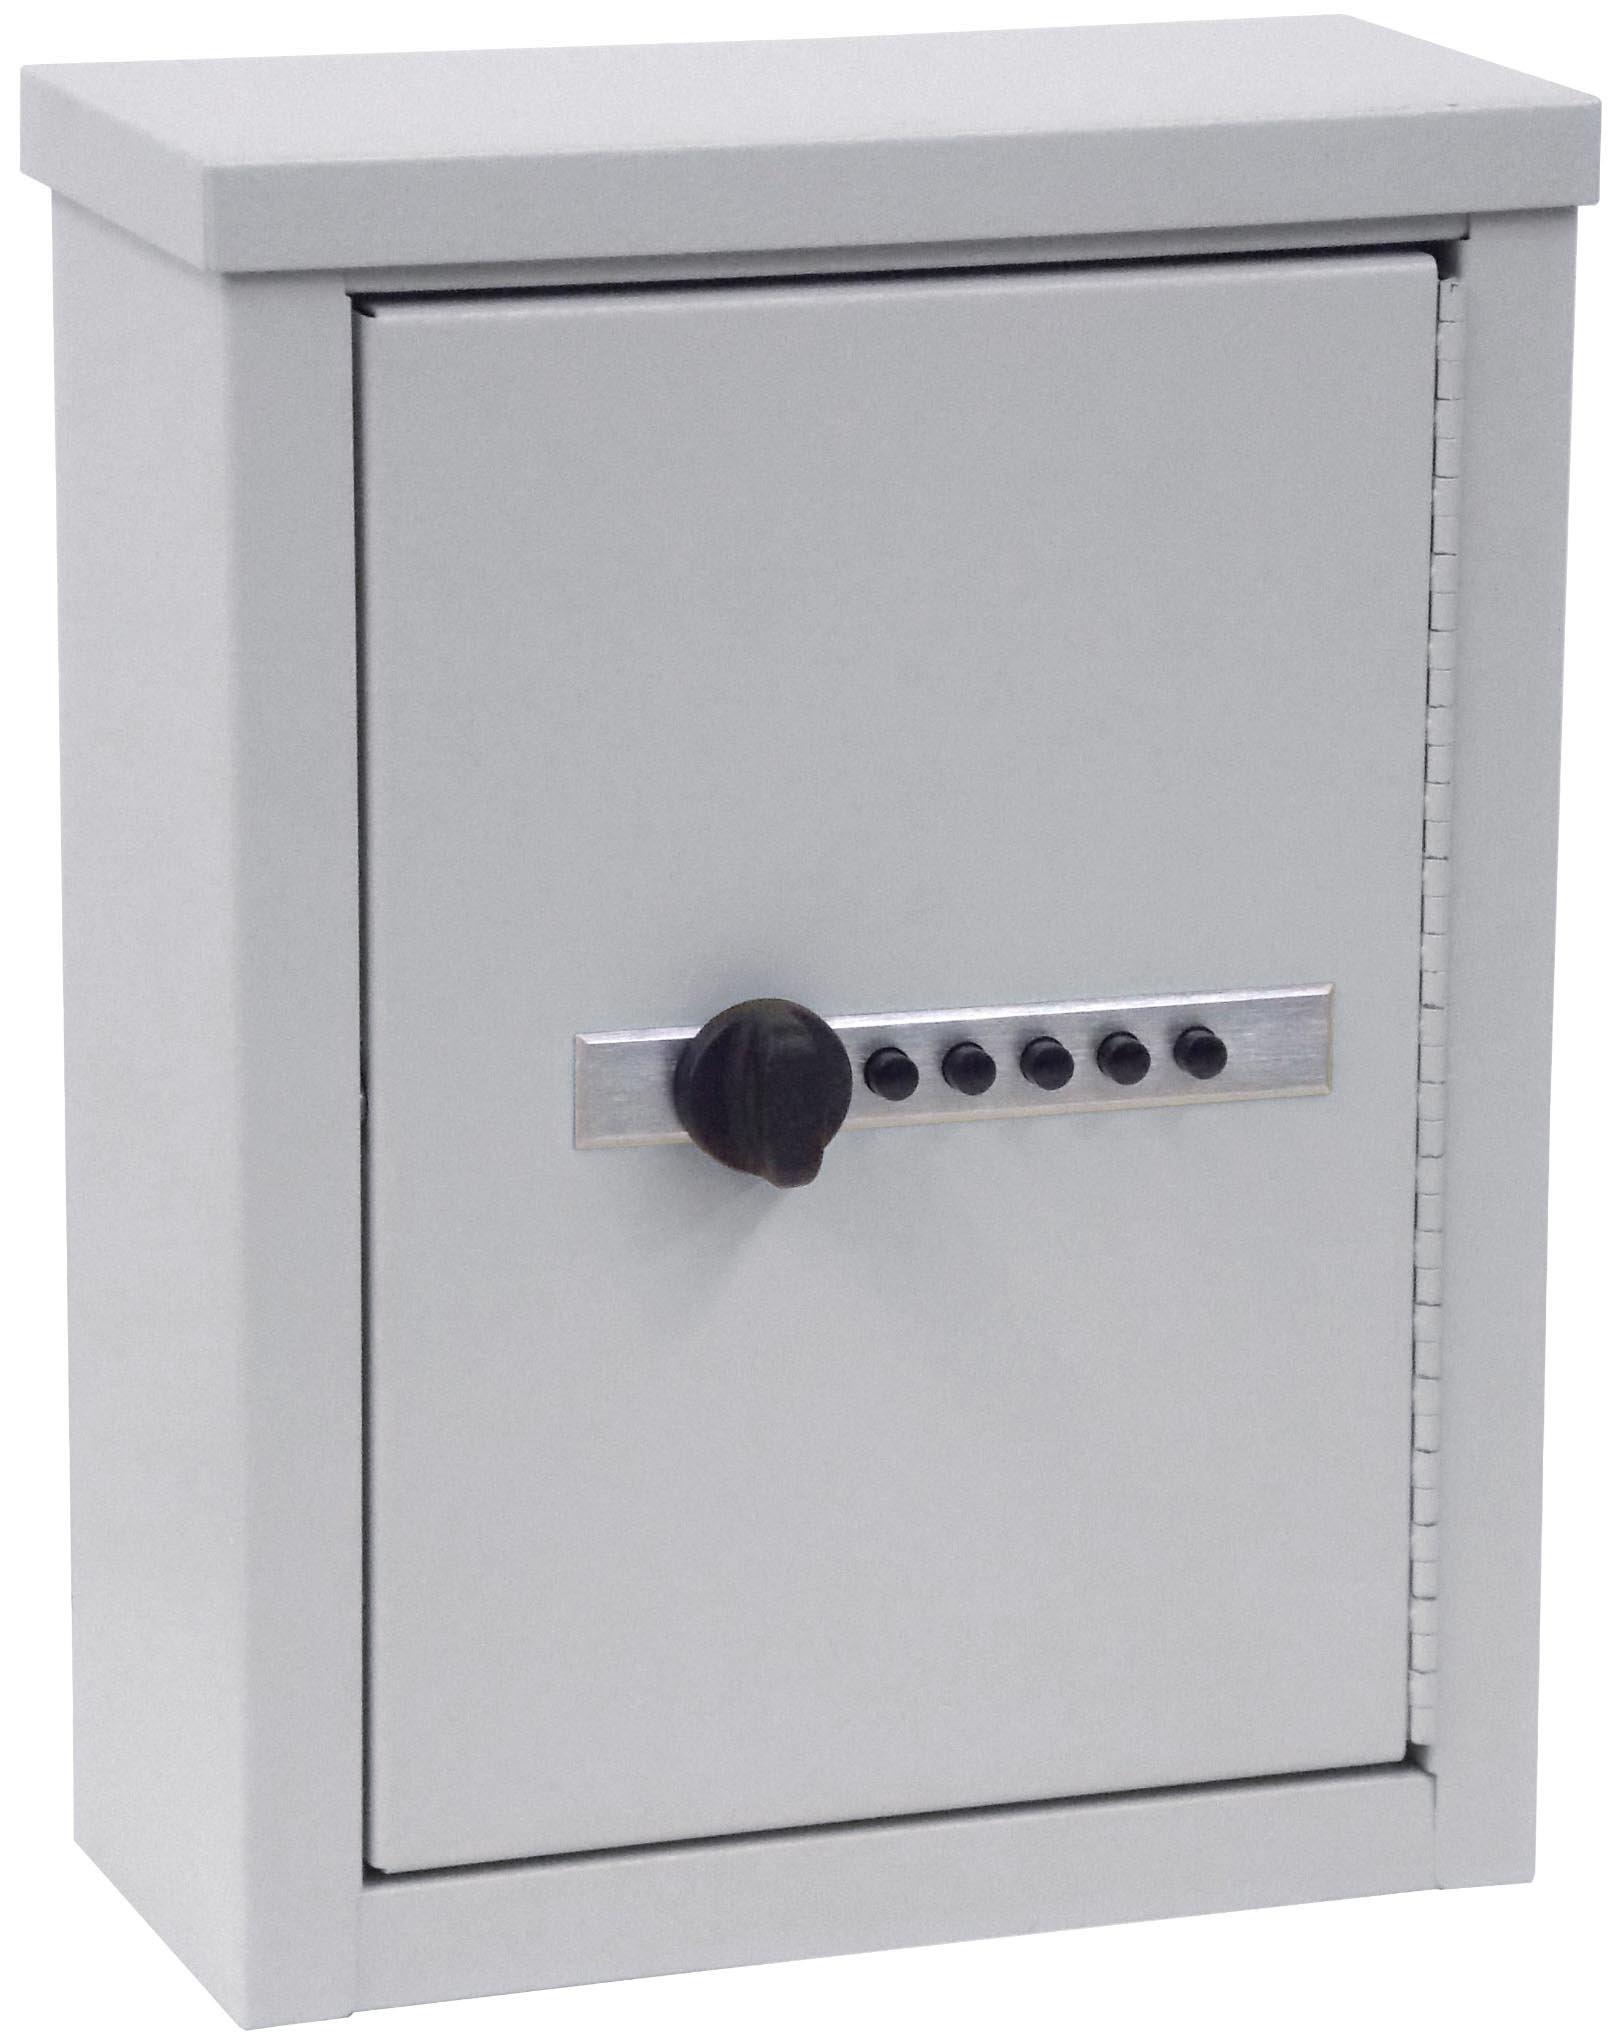 Mini Wall Storage Cabinet with Combination Lock - Light Grey